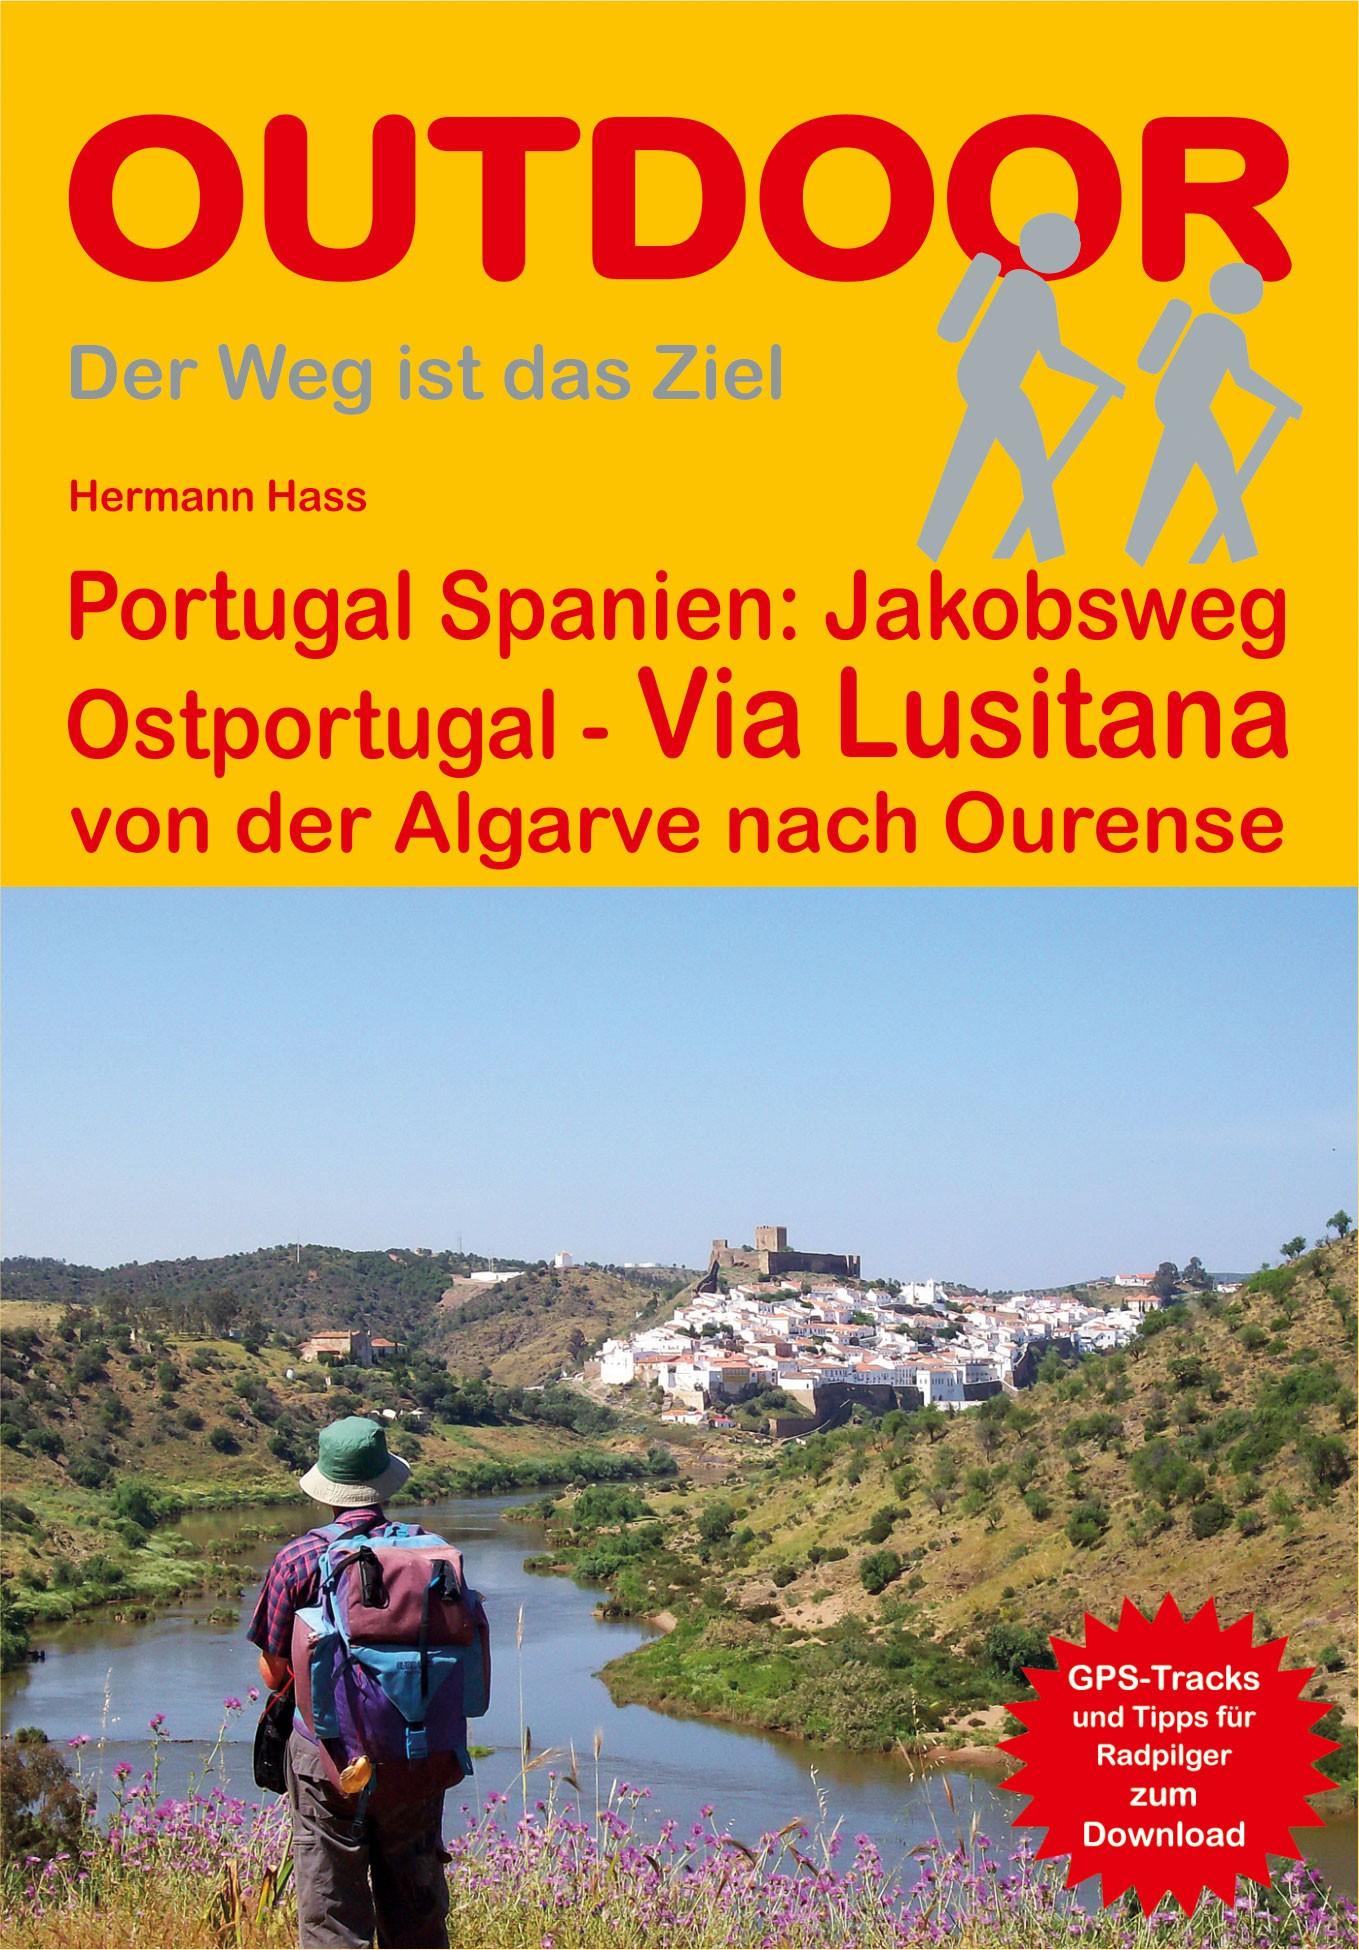 Portugal Spanien: Jakobsweg Via Lusitana